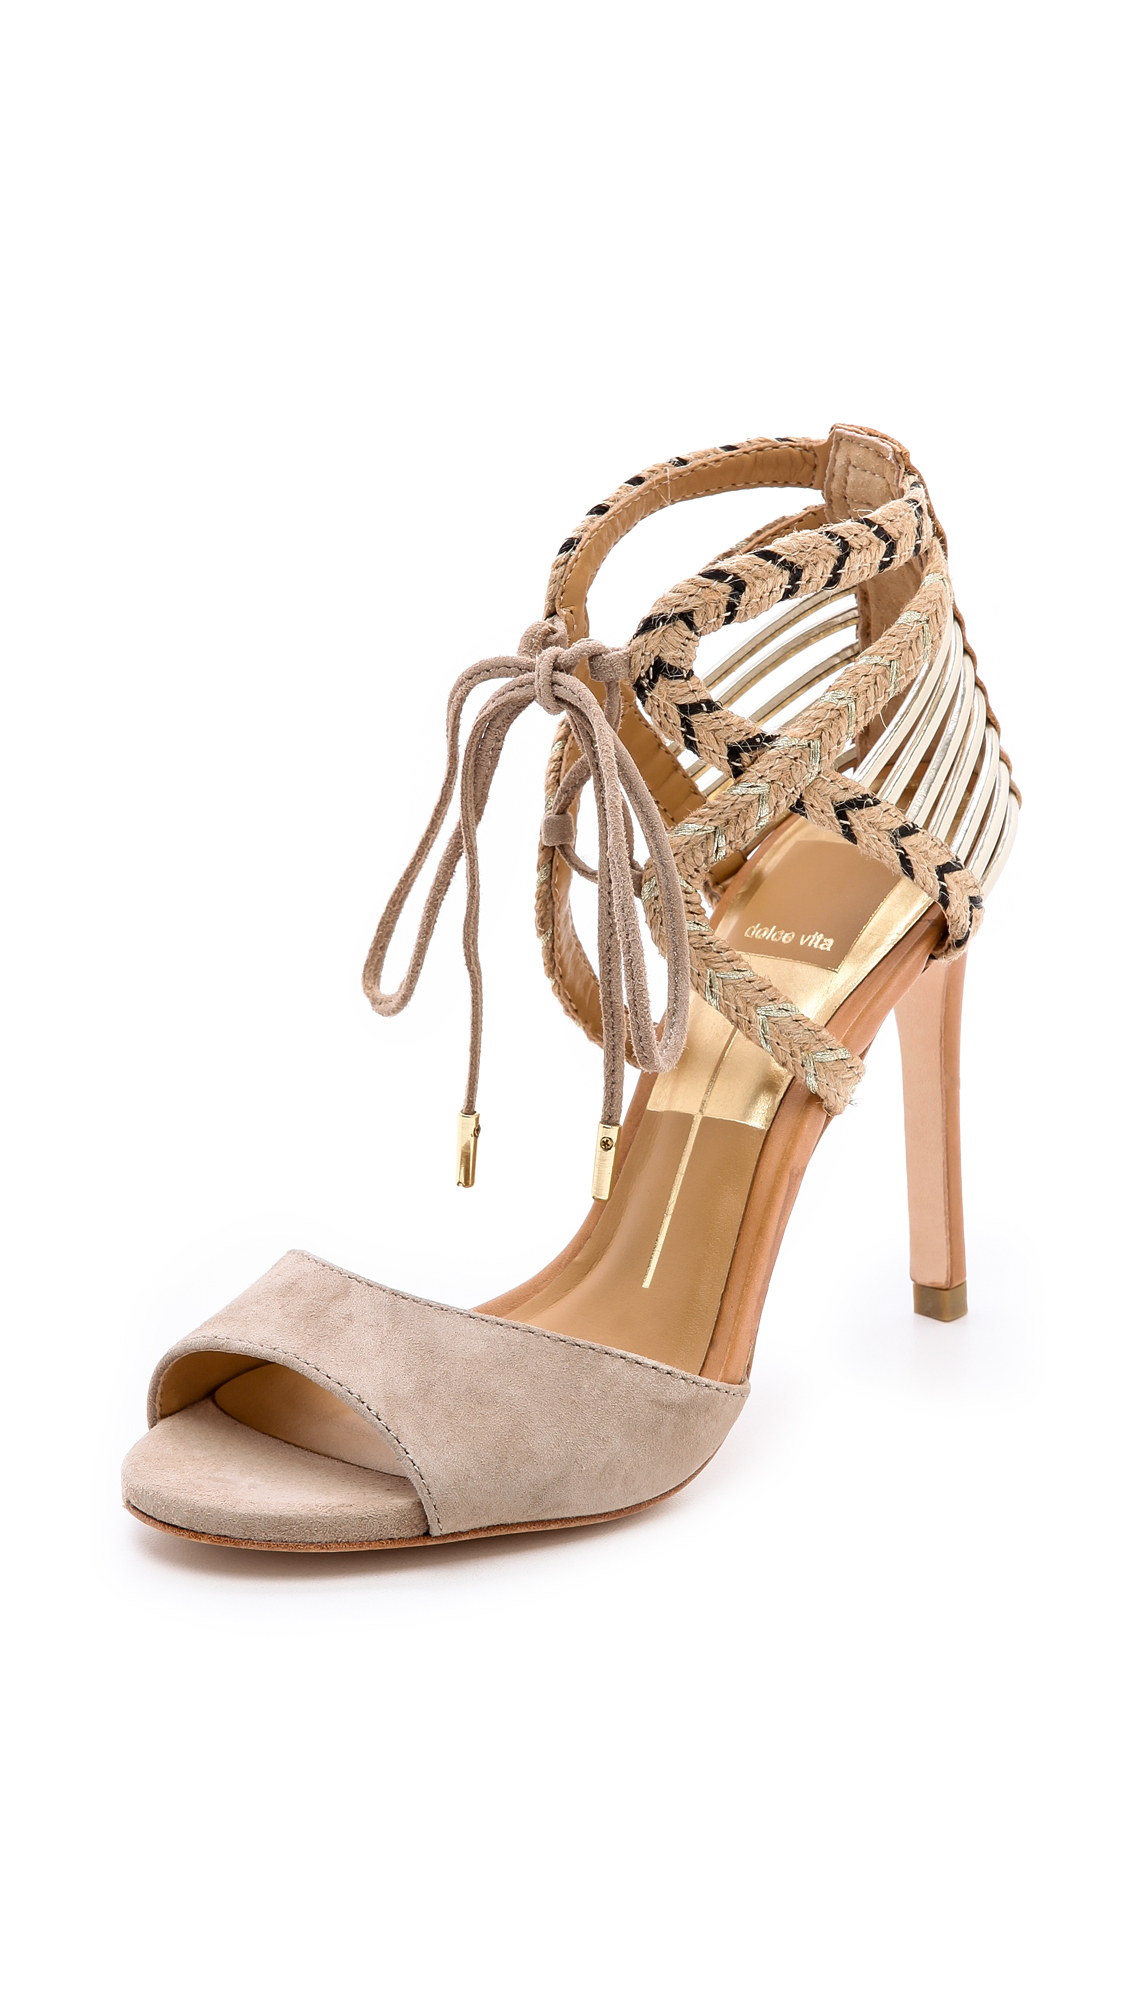 Dolce Vita Womens Fray Gladiator Sandal >>> Unbelievable